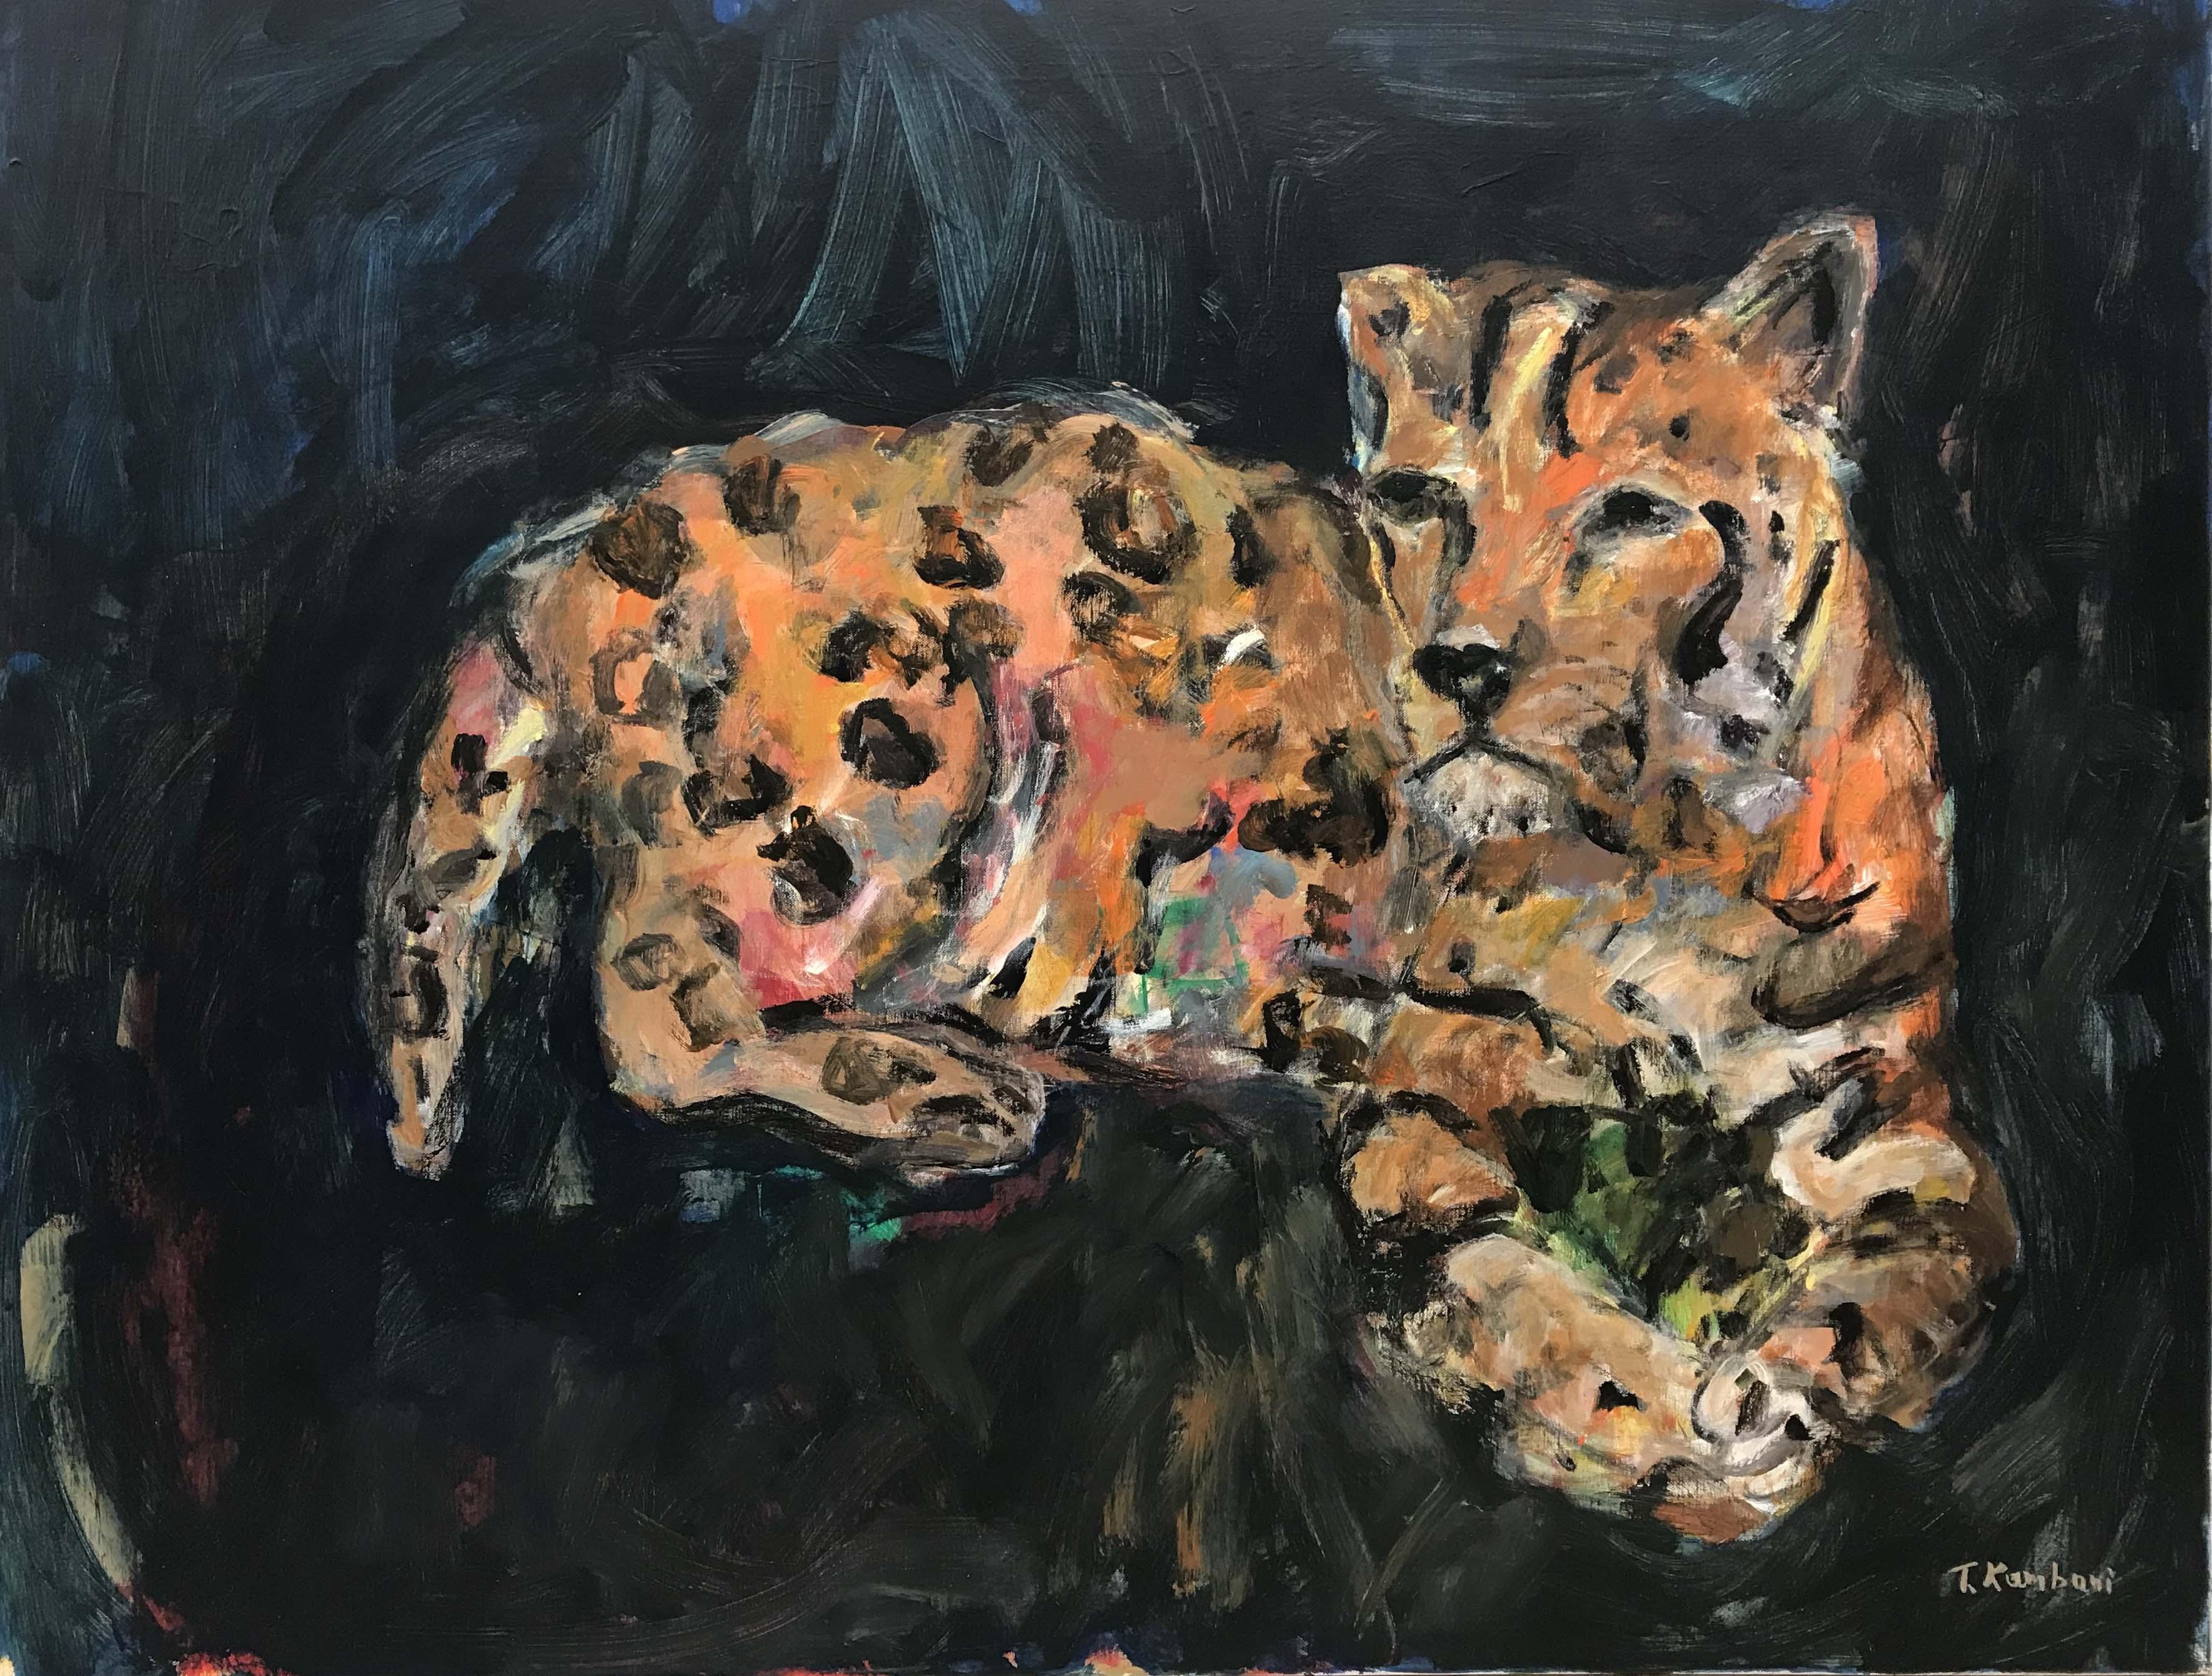 Inner energy, 116x89cm, Acrylique sut toile, 2018 sm